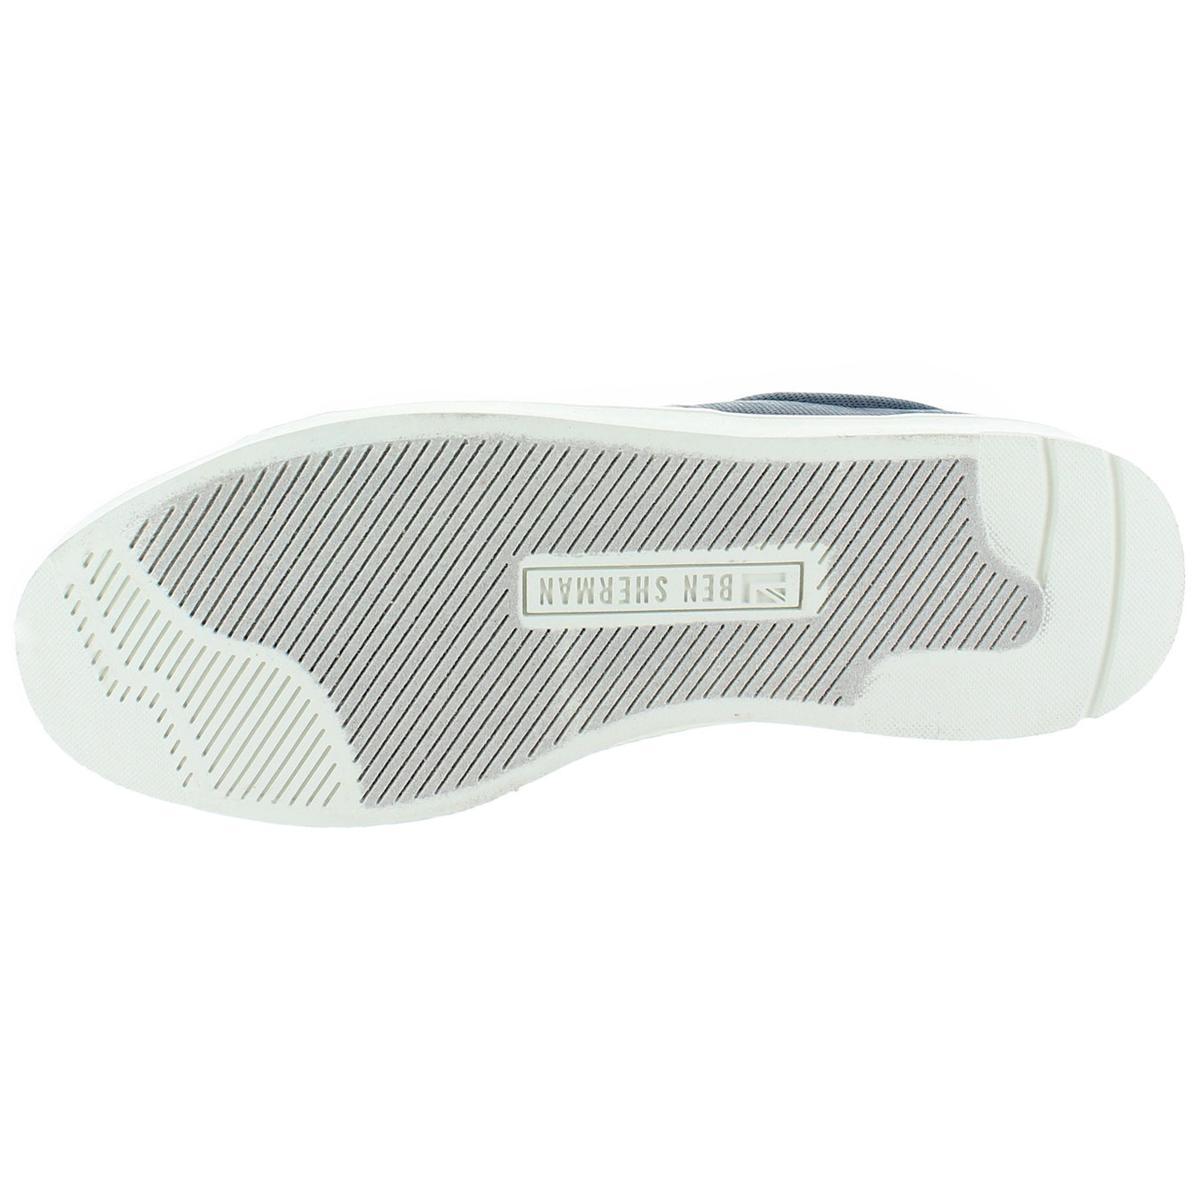 Ben-Sherman-Ashton-Men-039-s-Fashion-Court-Sneakers-Shoes thumbnail 6